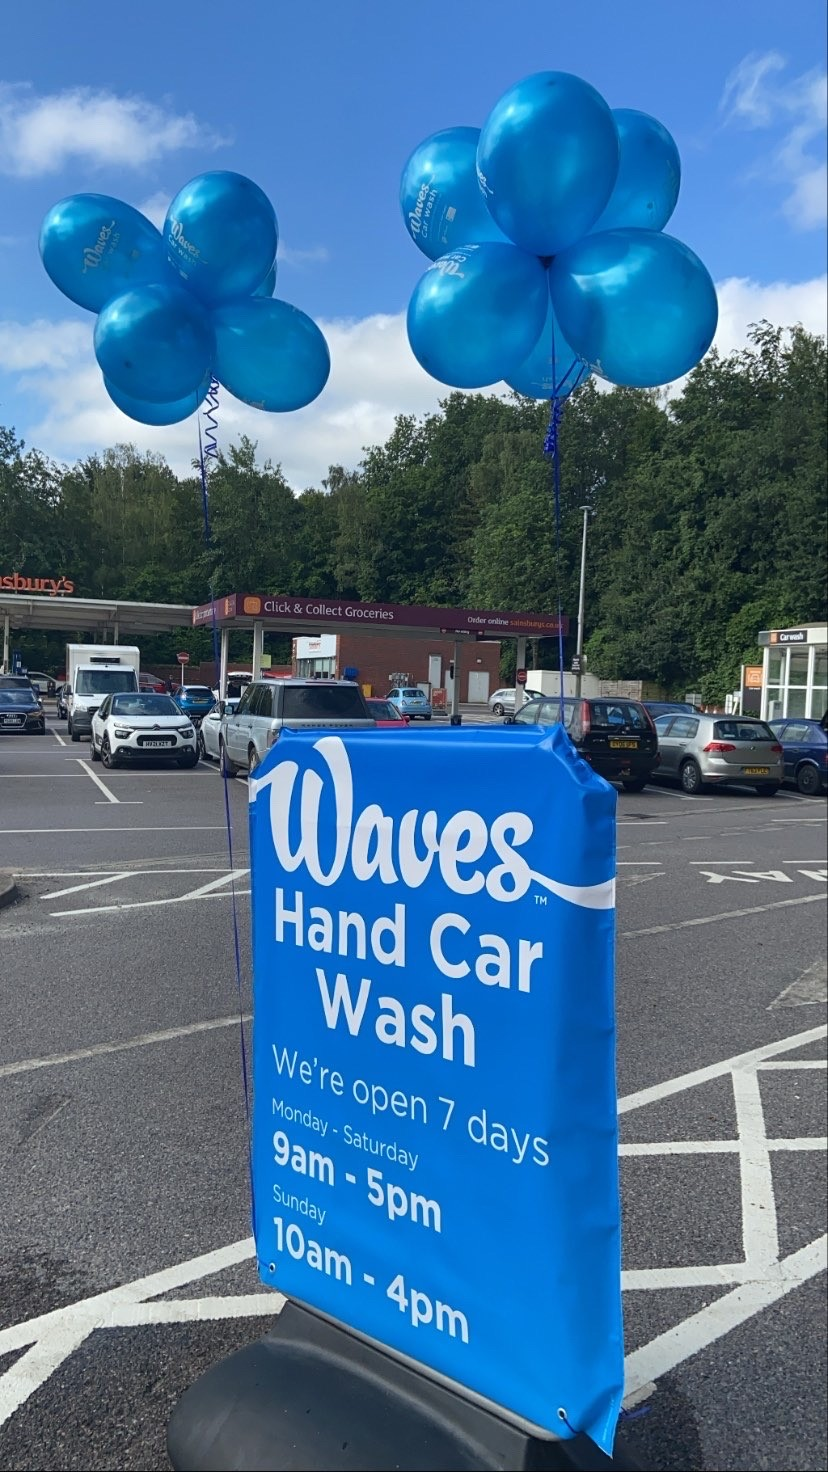 Waves Hand Car Wash